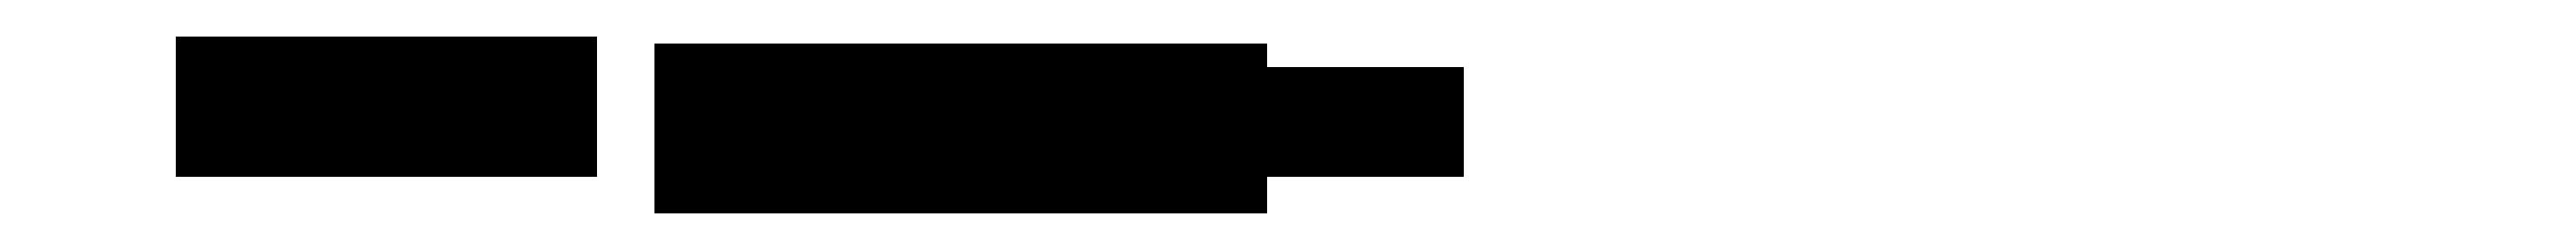 Typeface-Heimat-Sans-F04-Atlas-Font-Foundry